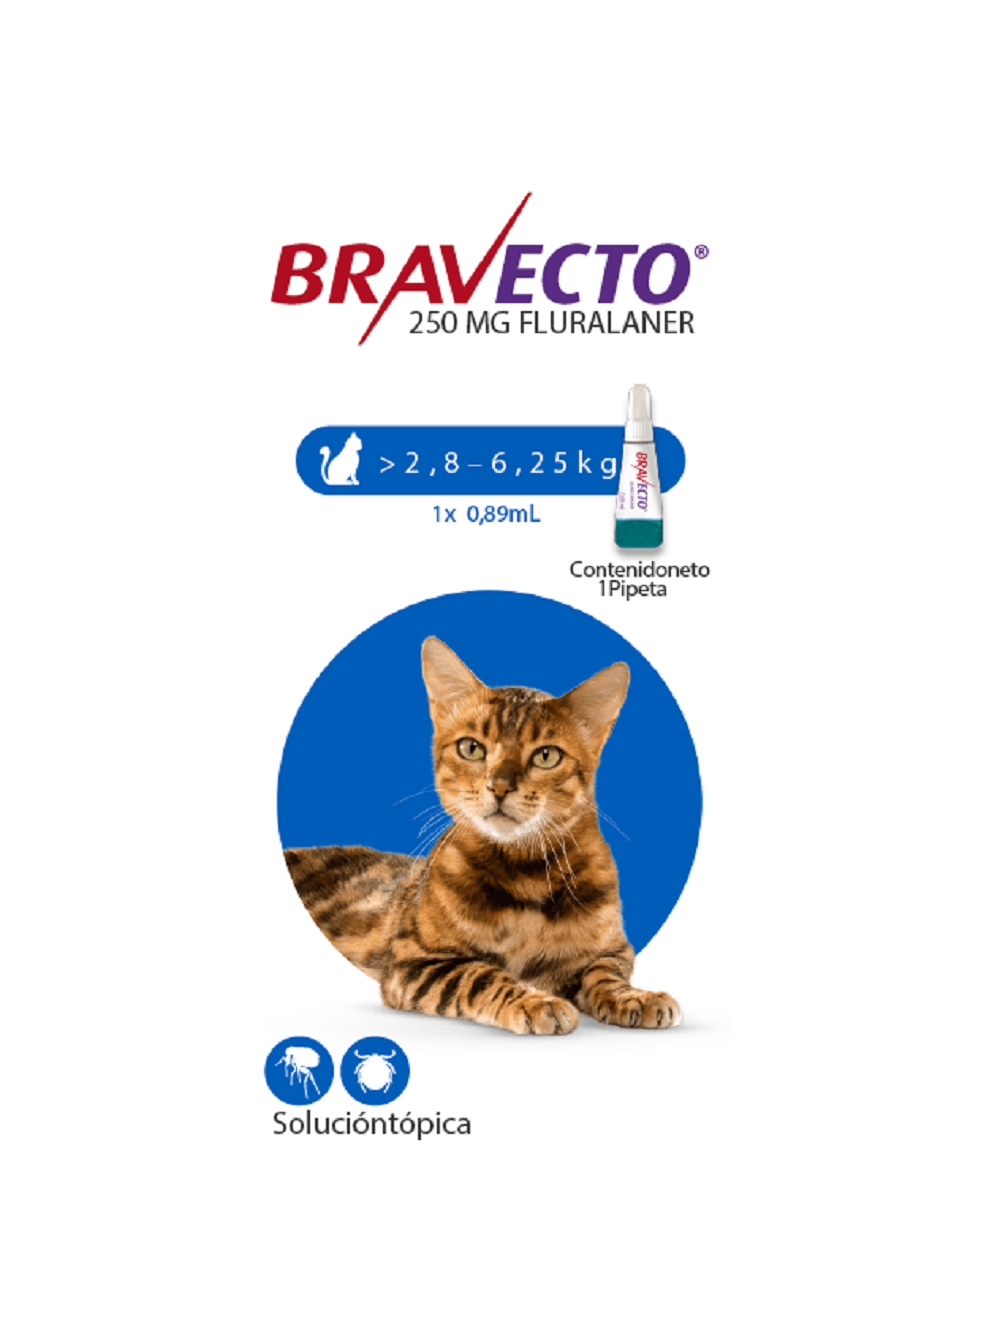 Antipulgas Bravecto Para Gato Spot - ciudaddemascotas.com